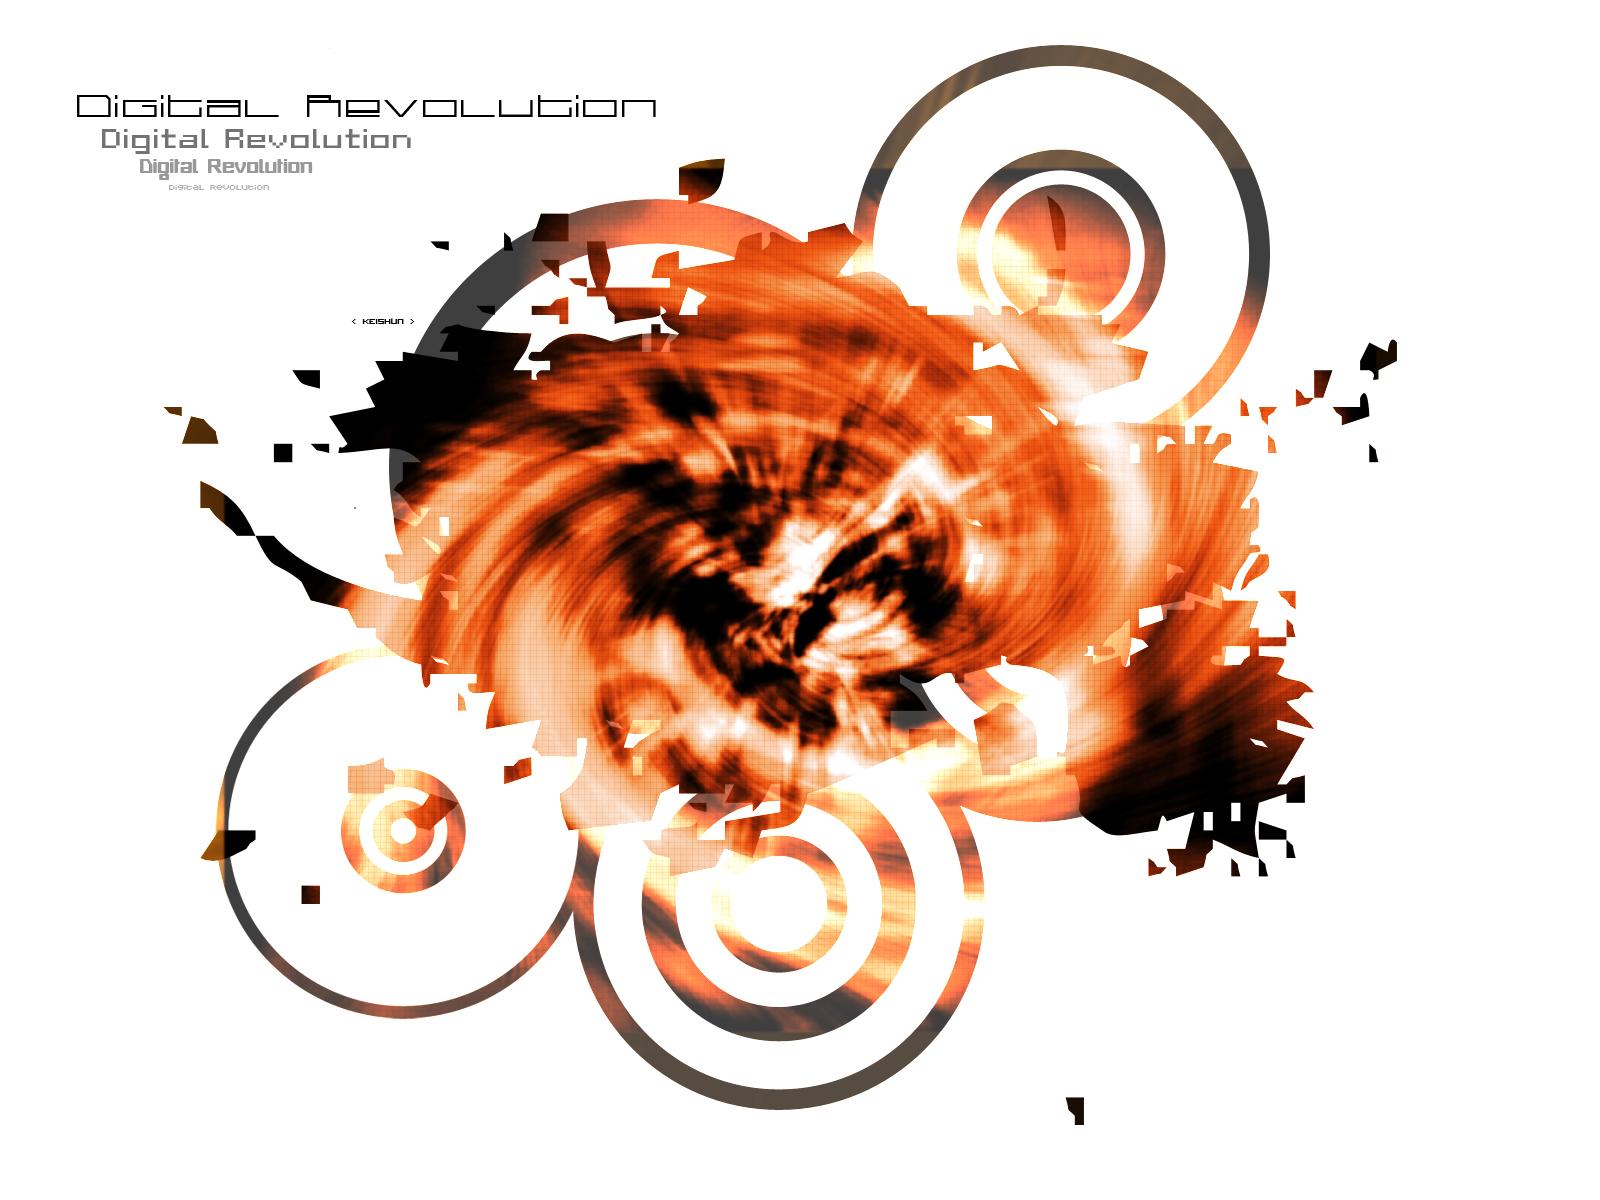 Digital Revolution 2 by Keishun